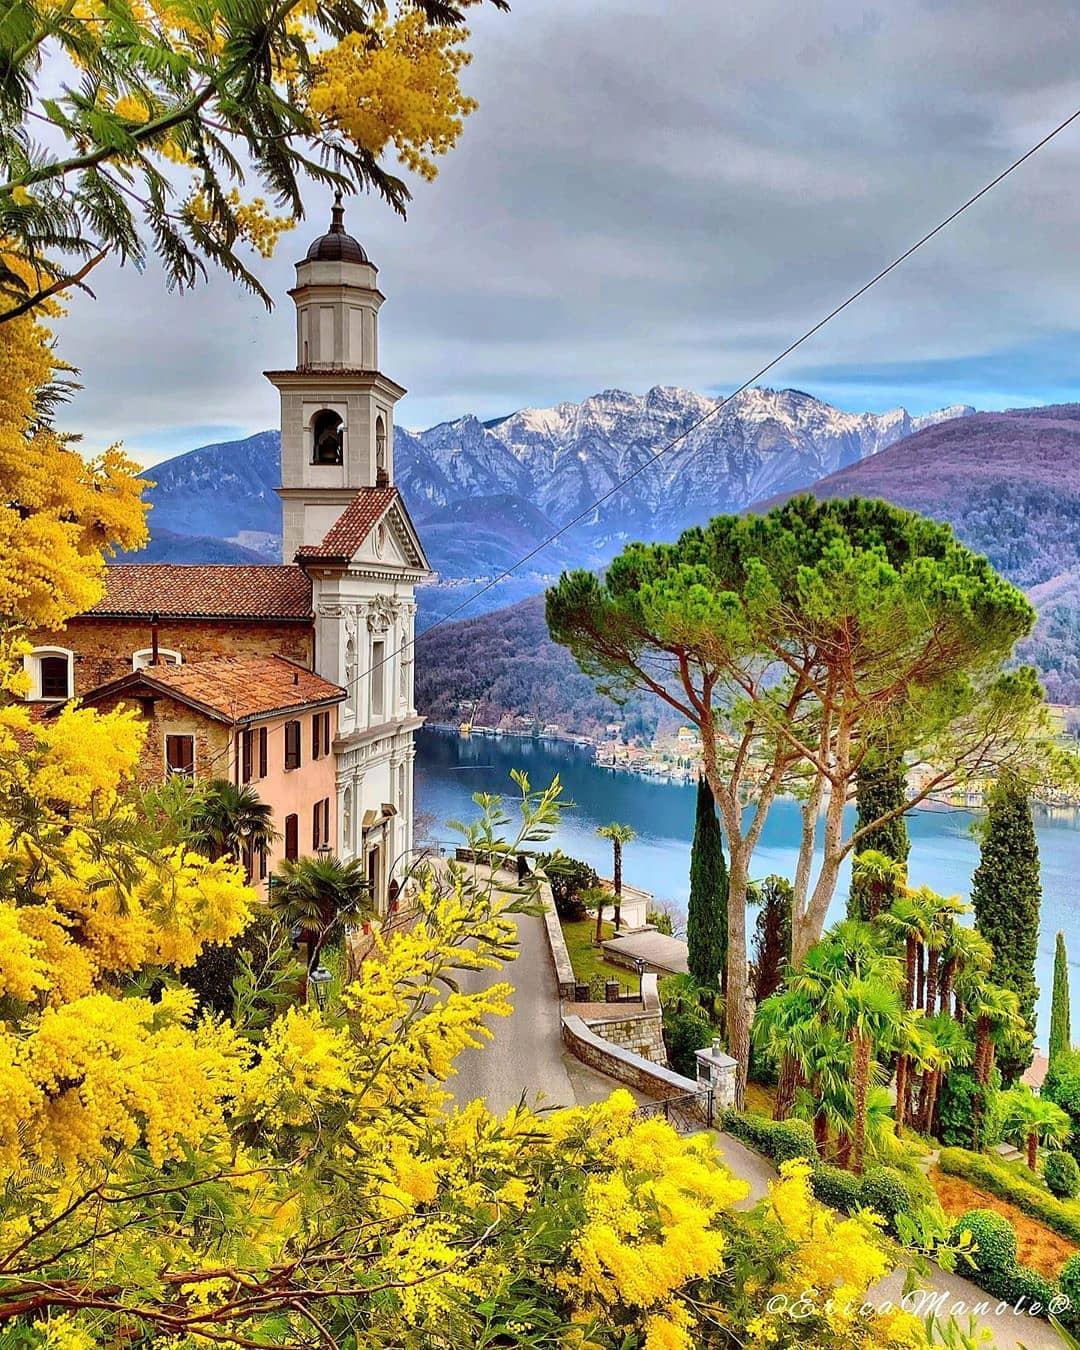 Ticino, #Svizzera 🇨🇭  📸 swissmonamour https://t.co/zW9dVeXEgD